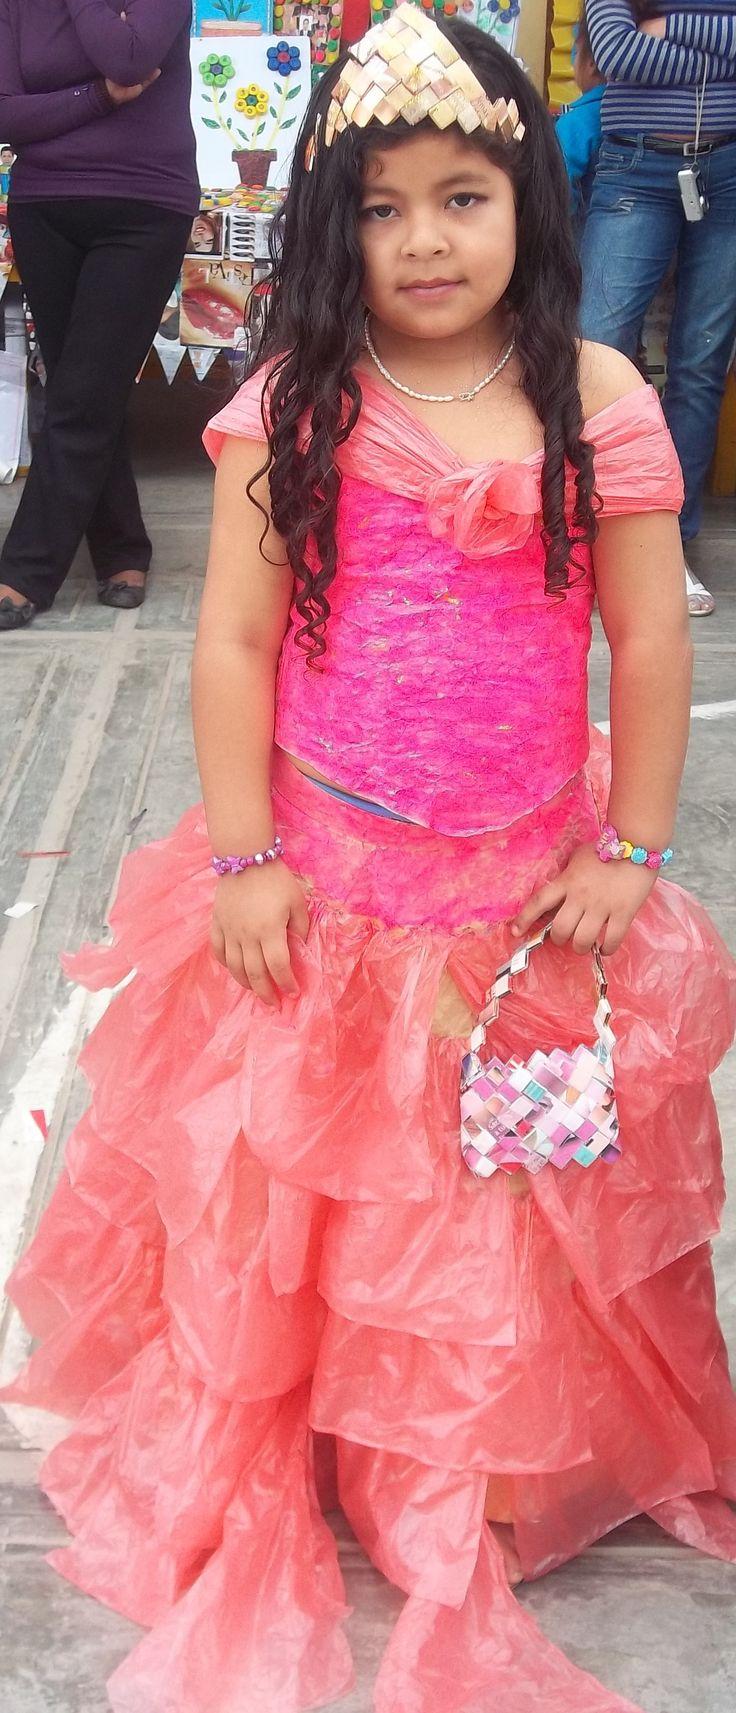 48 best vestidos images on Pinterest | Curve mini dresses, Elegant ...